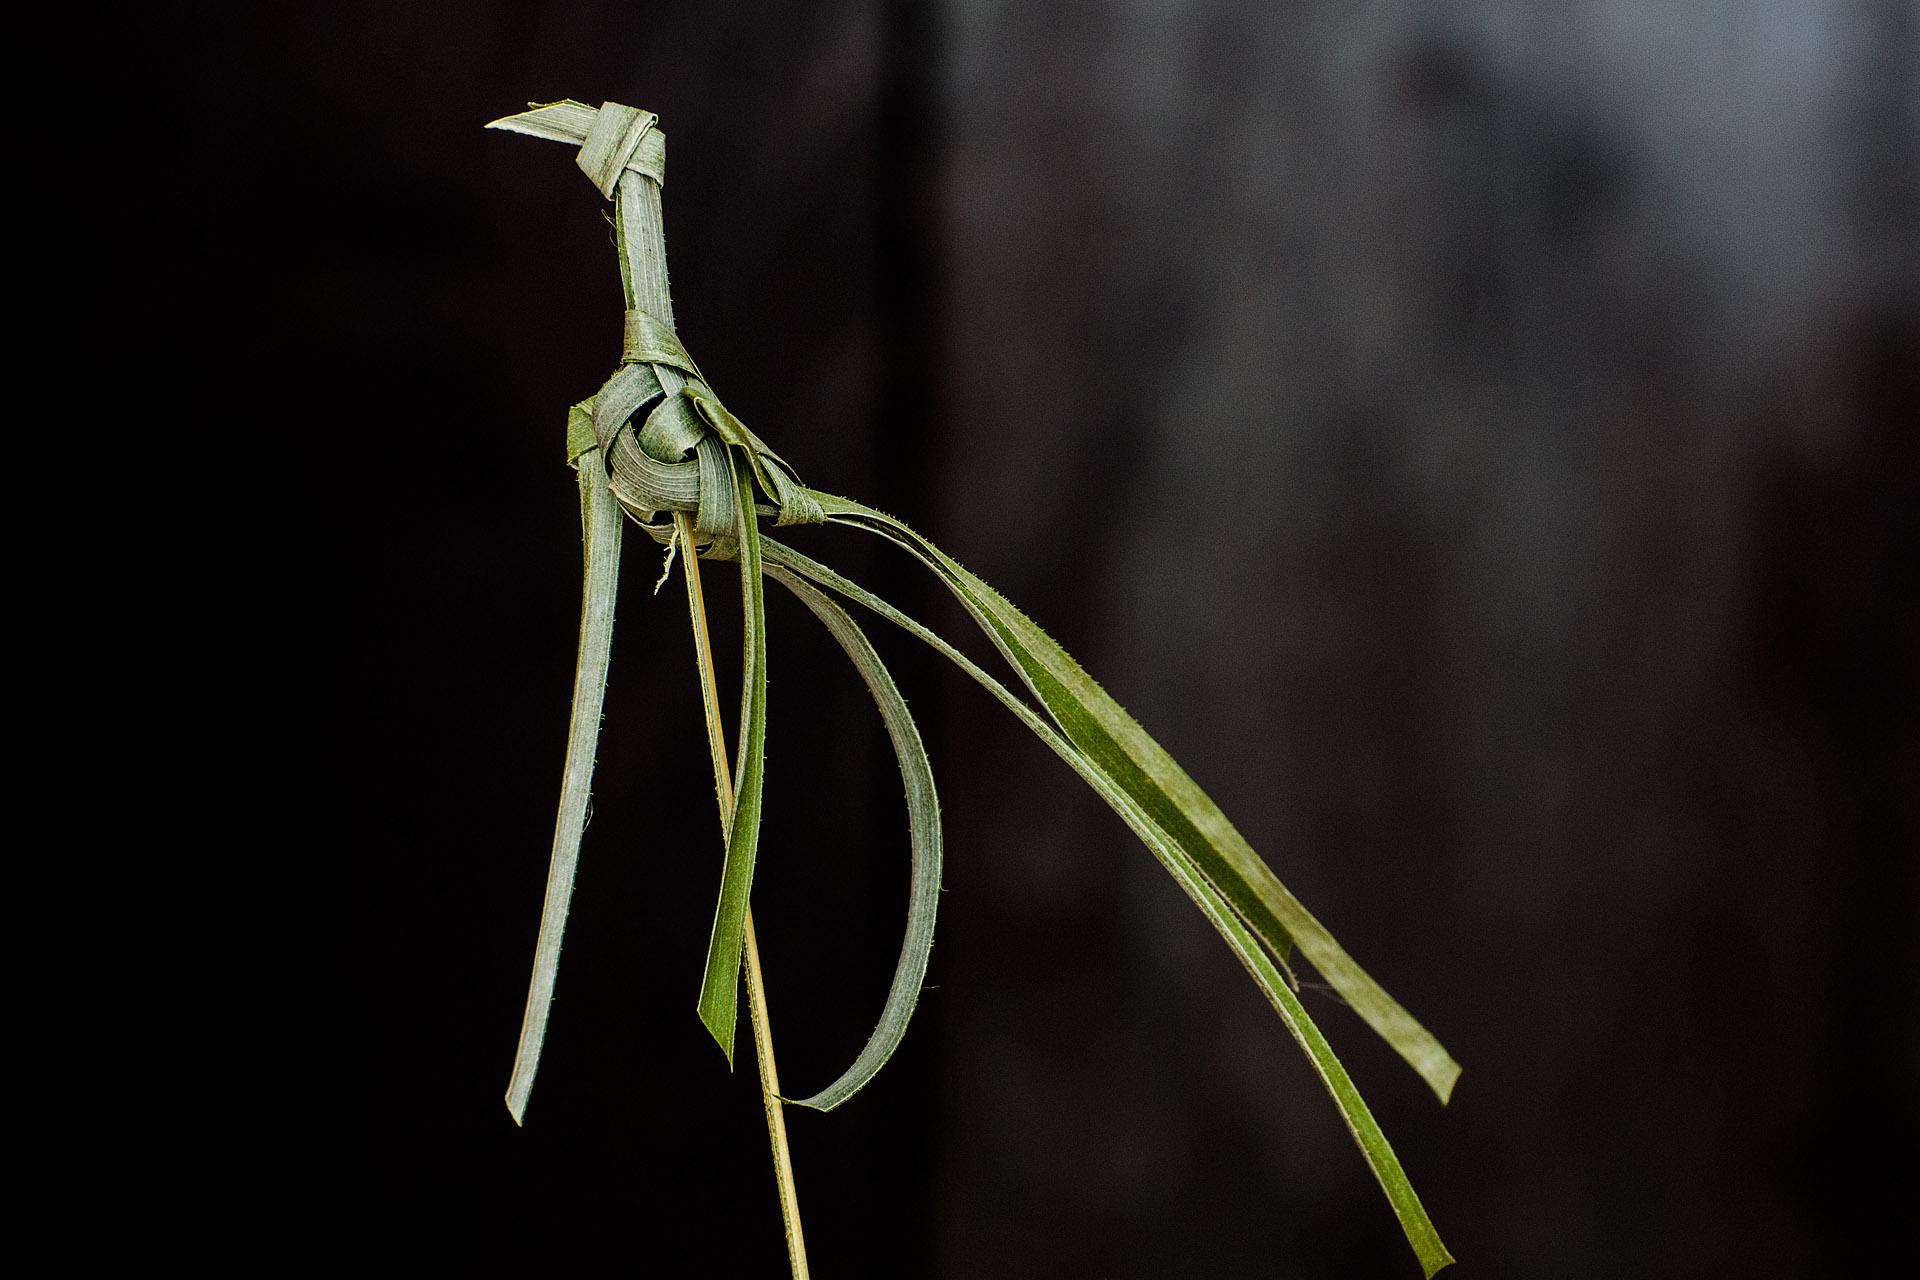 Coconut leaf crane